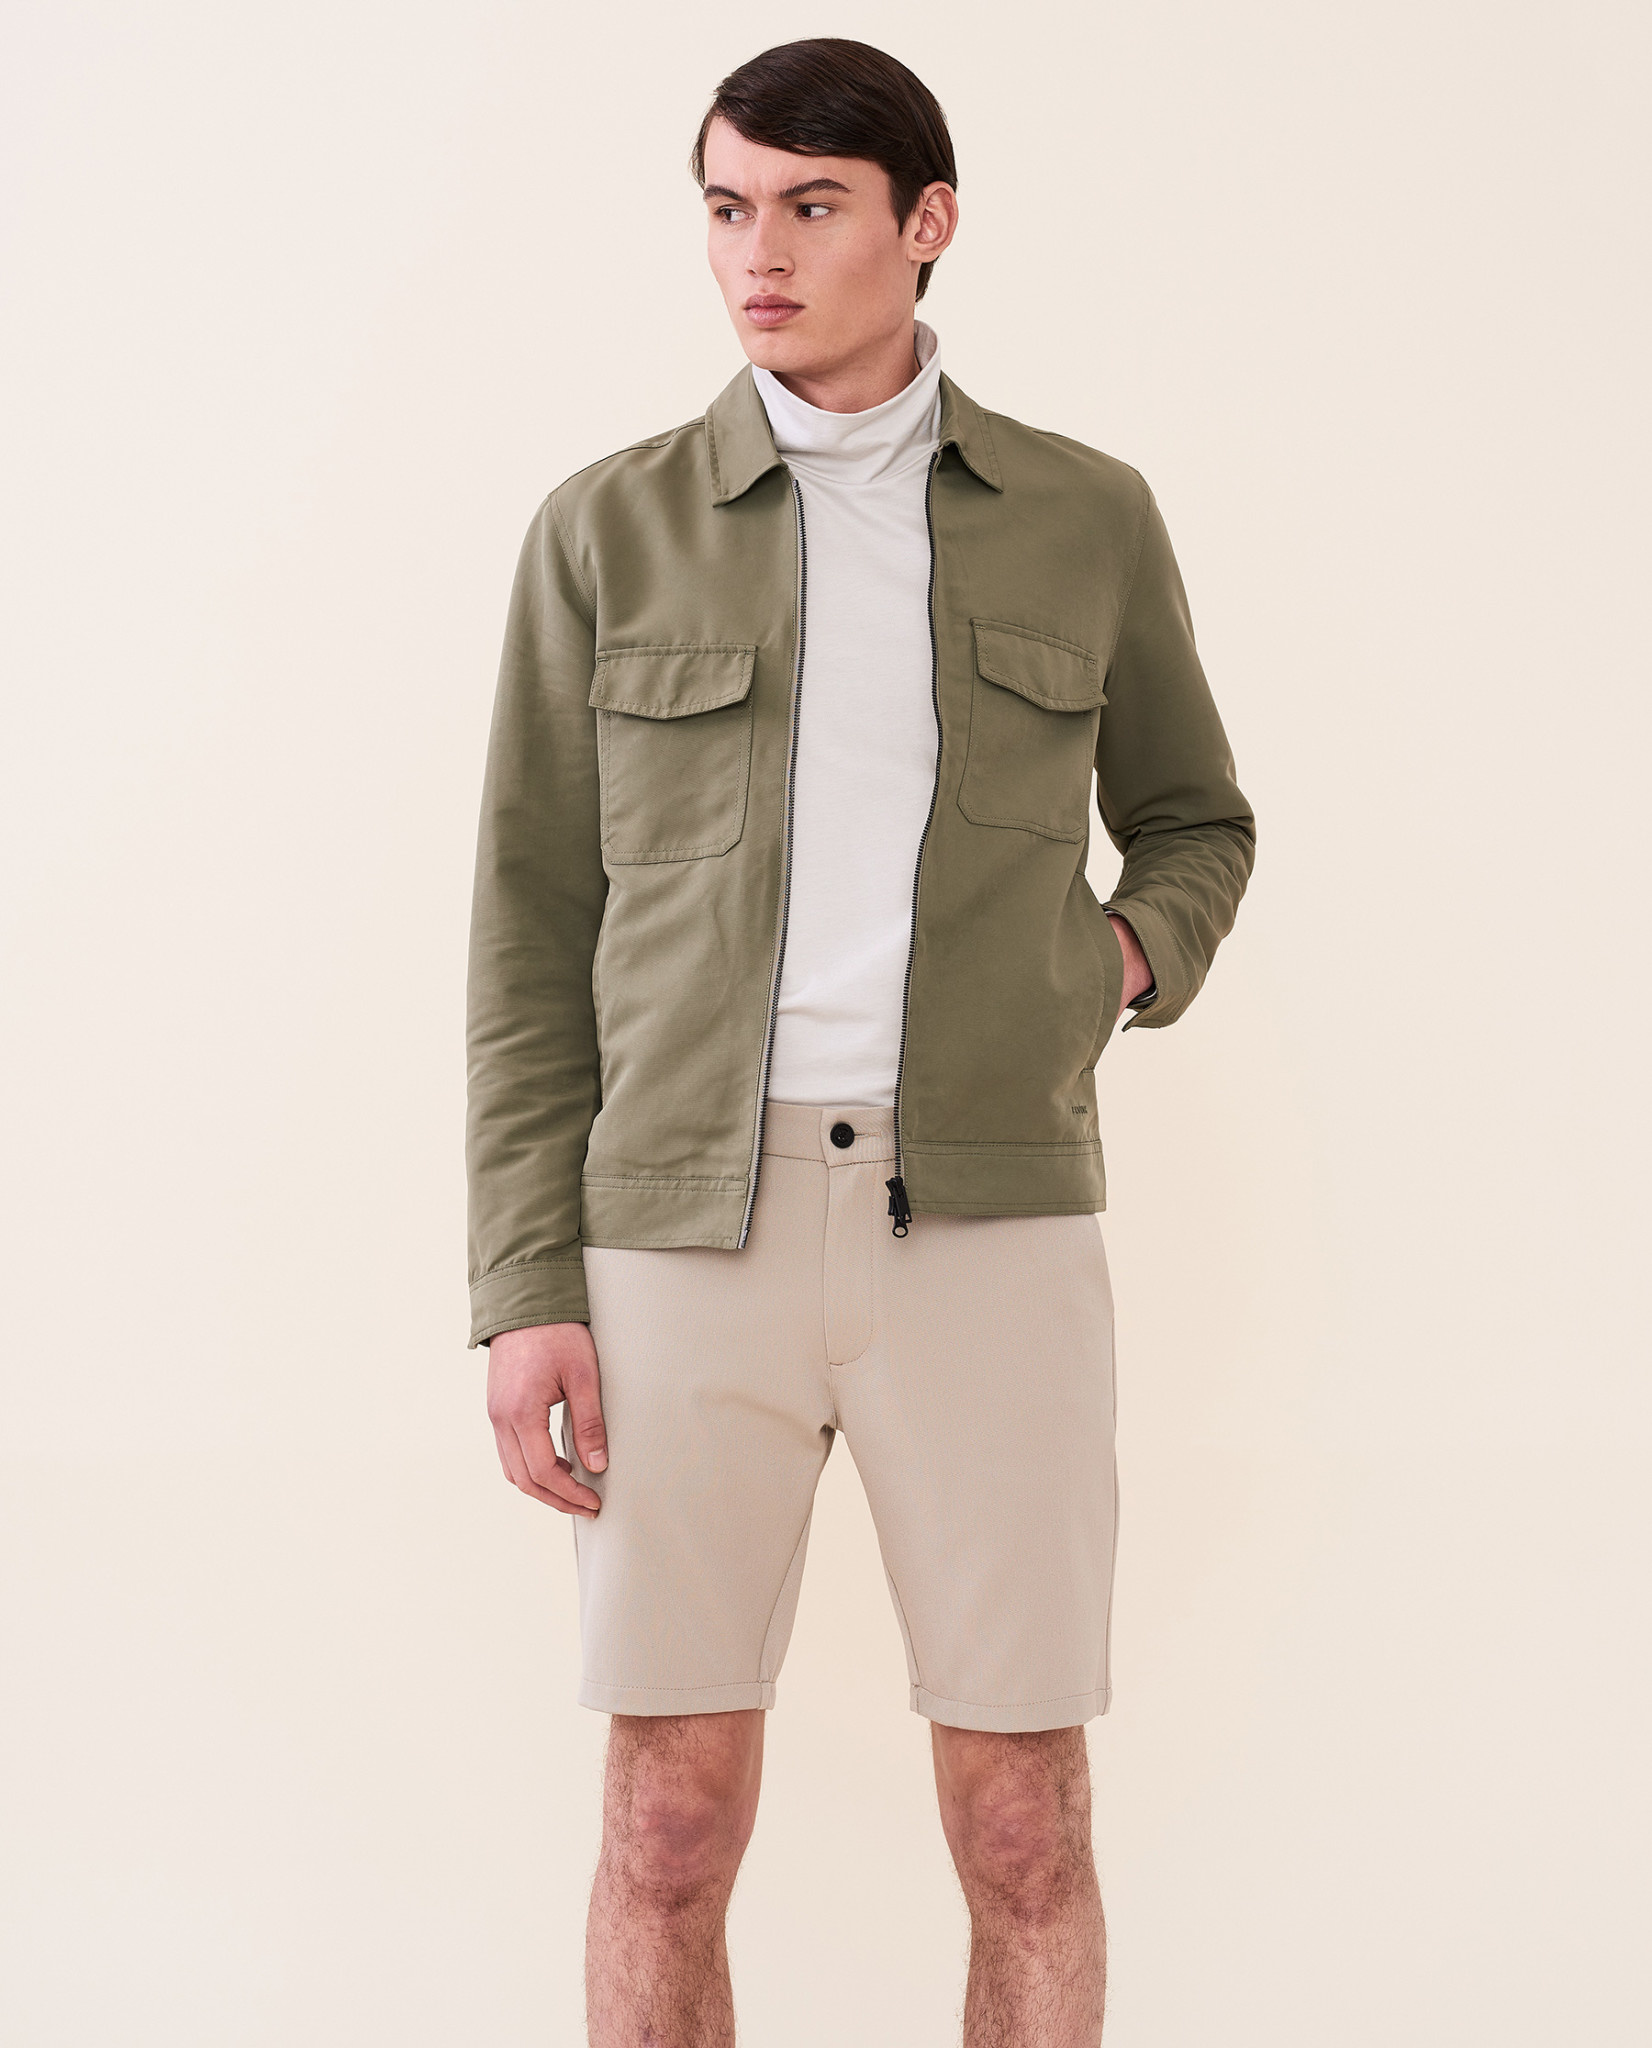 Elvine Elvine Kristoffer Jacket Faded Green